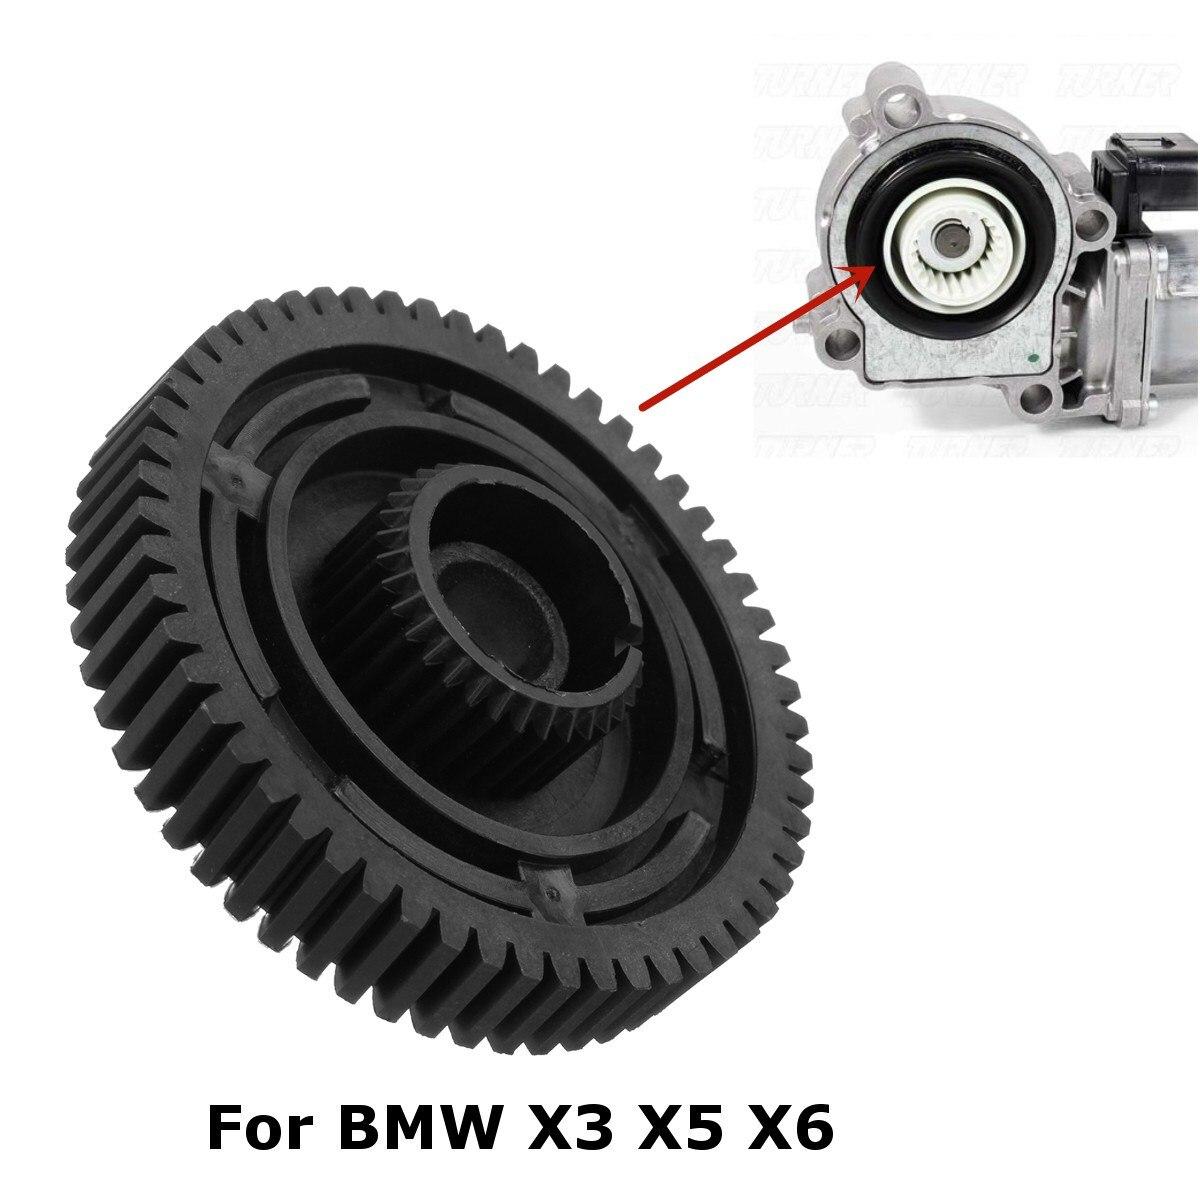 Auto Verteilergetriebe Stellmotor Reparatur Getriebe Servo Für BMW X3 X5 X6 E83 E53 E70 27107566296 8473227771